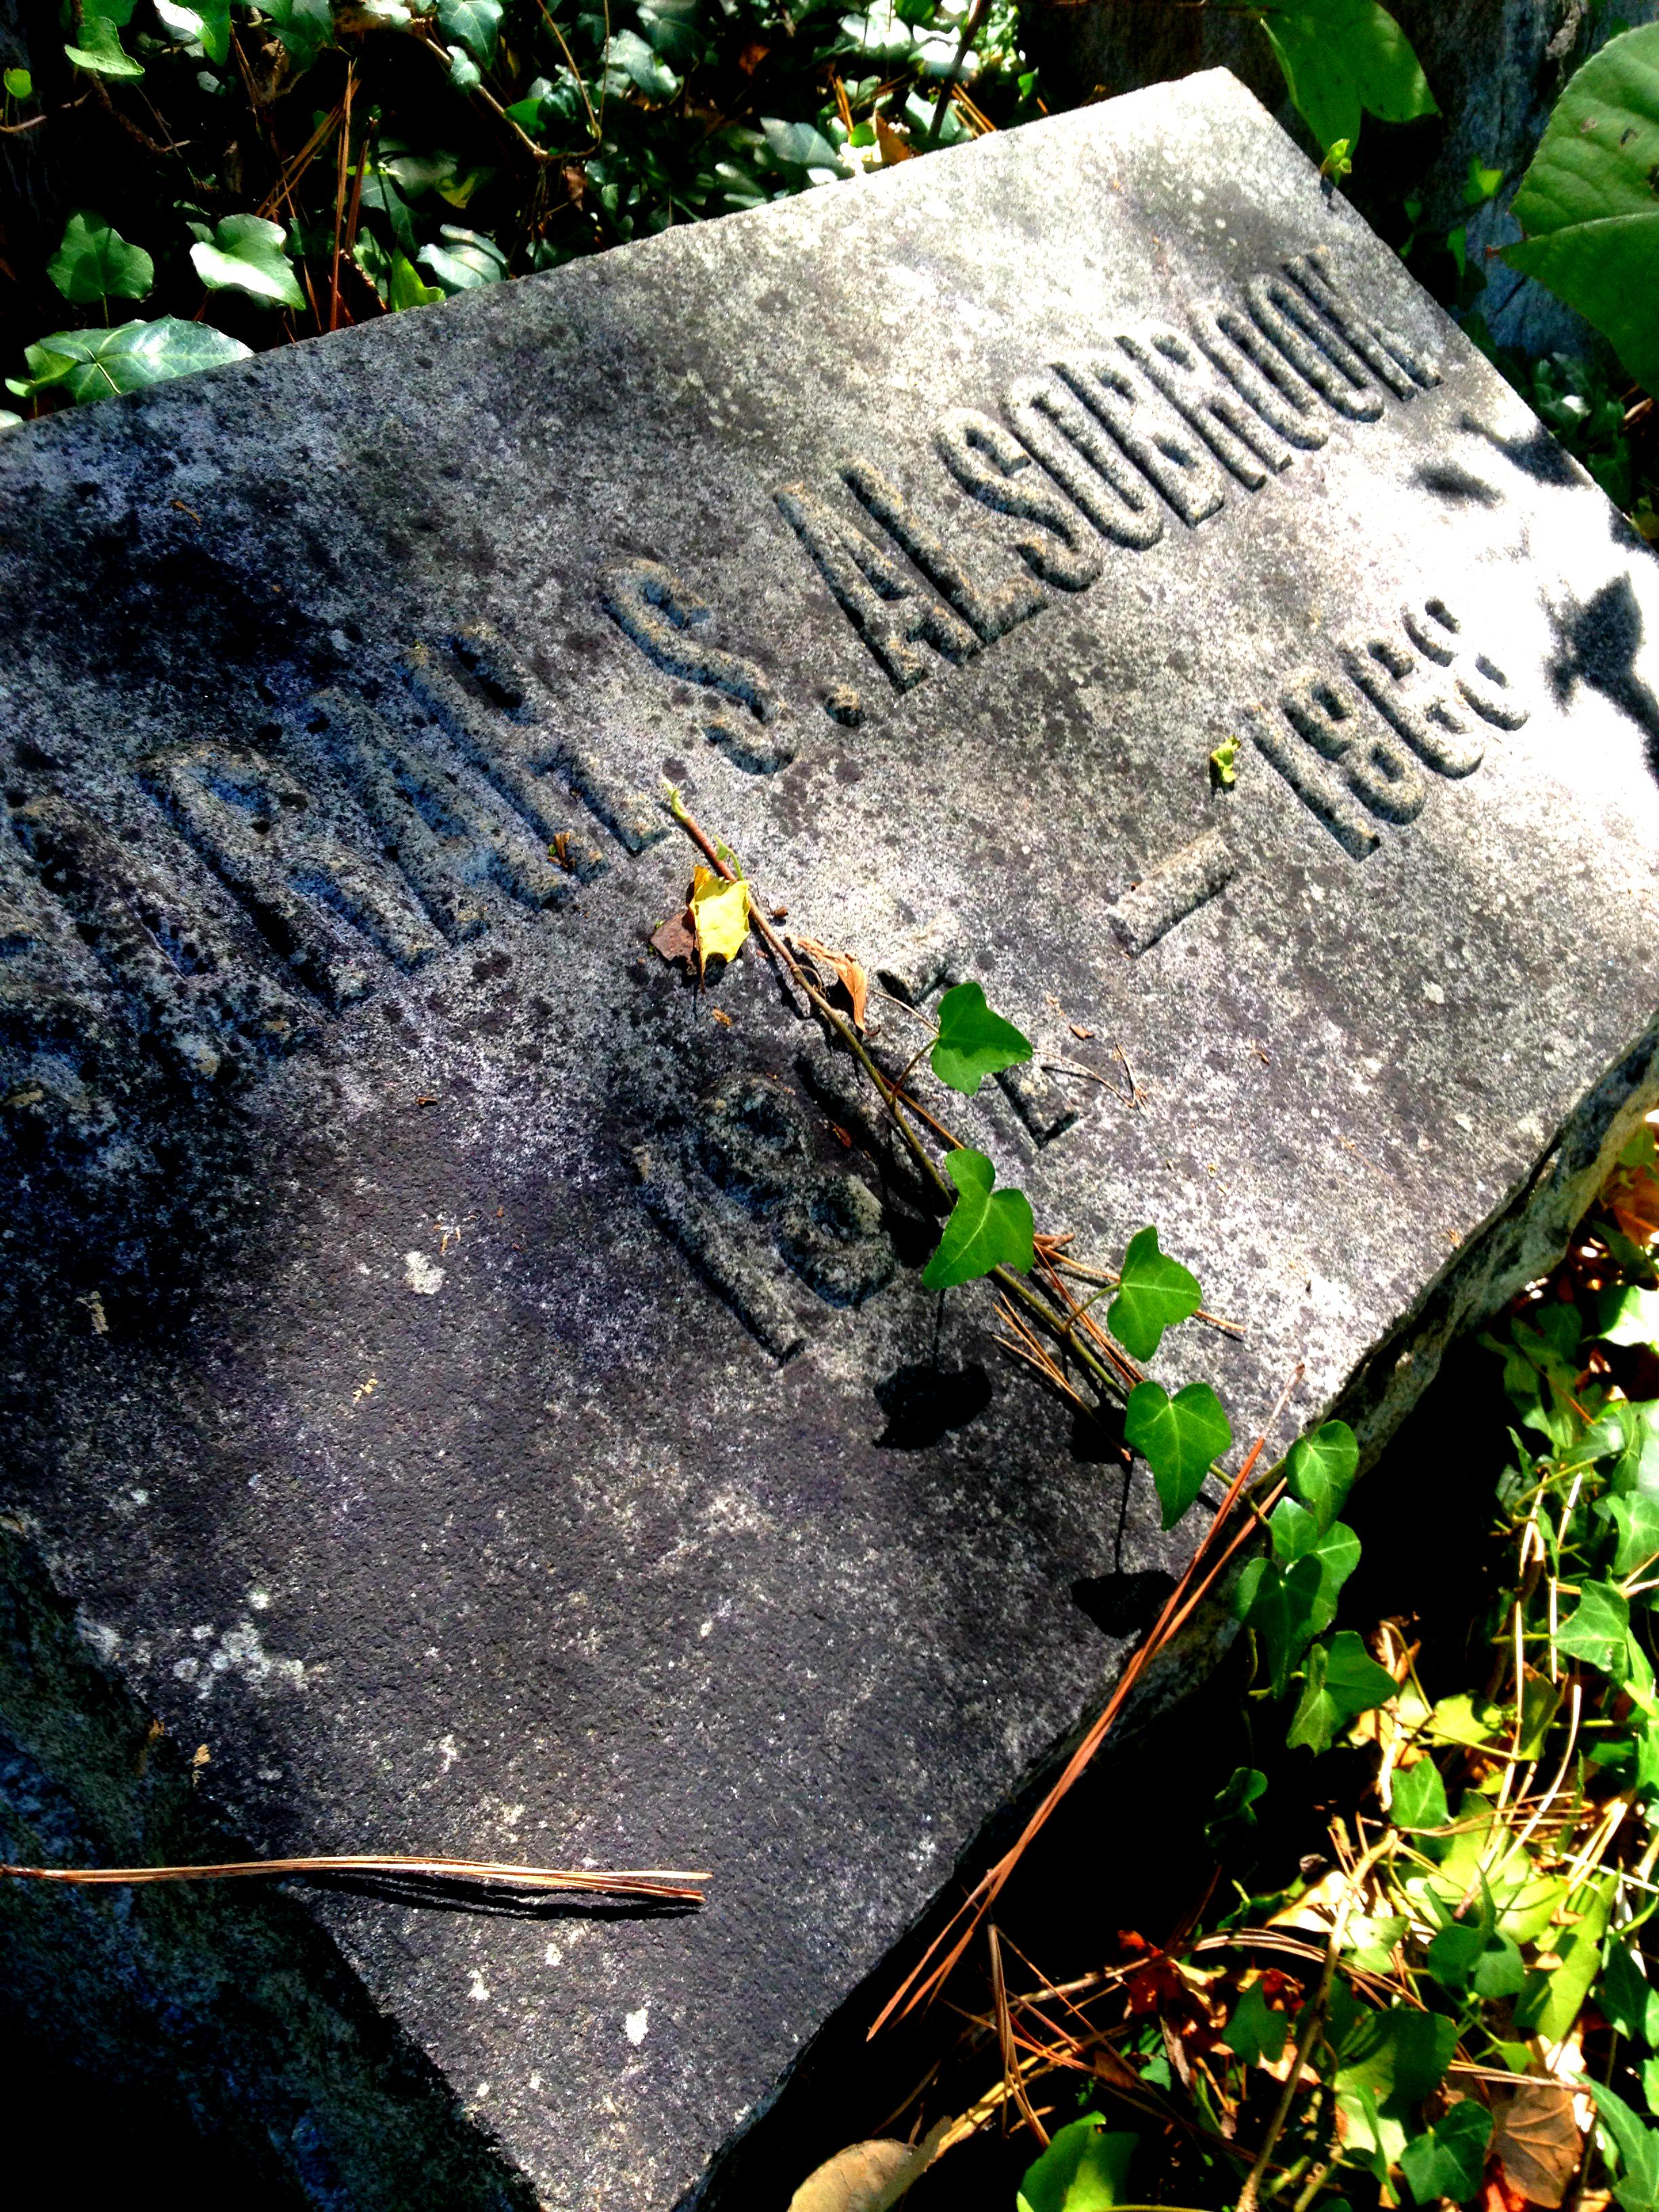 Sarah S Alsobrook 1807 - 1868 Alsobrook Family Cemetery - History Atlanta  2014